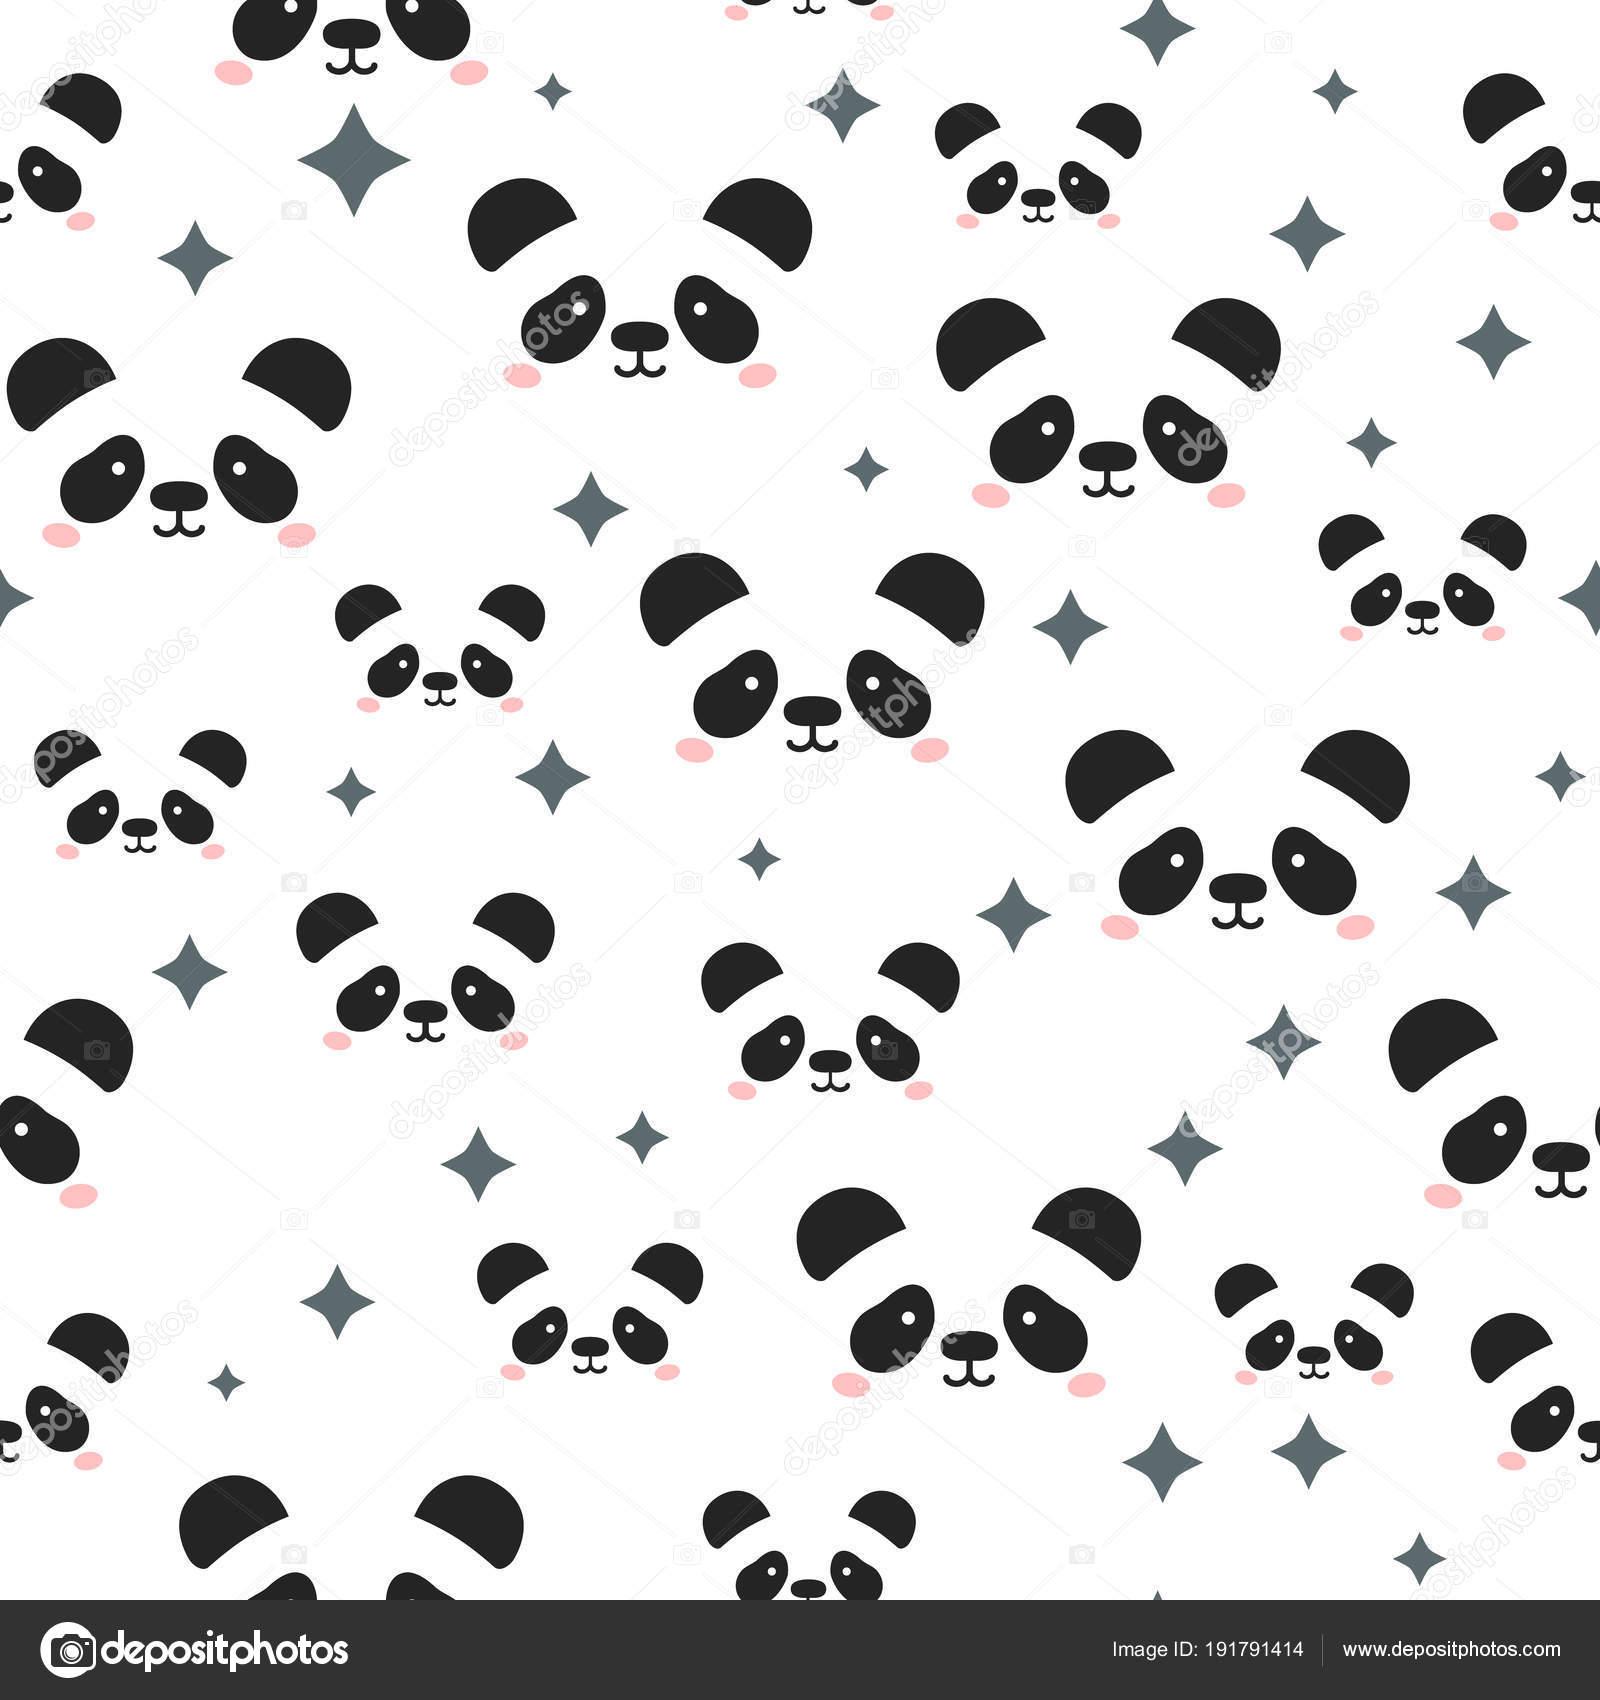 imágenes caras de pandas animados cara de panda lindo fondo de